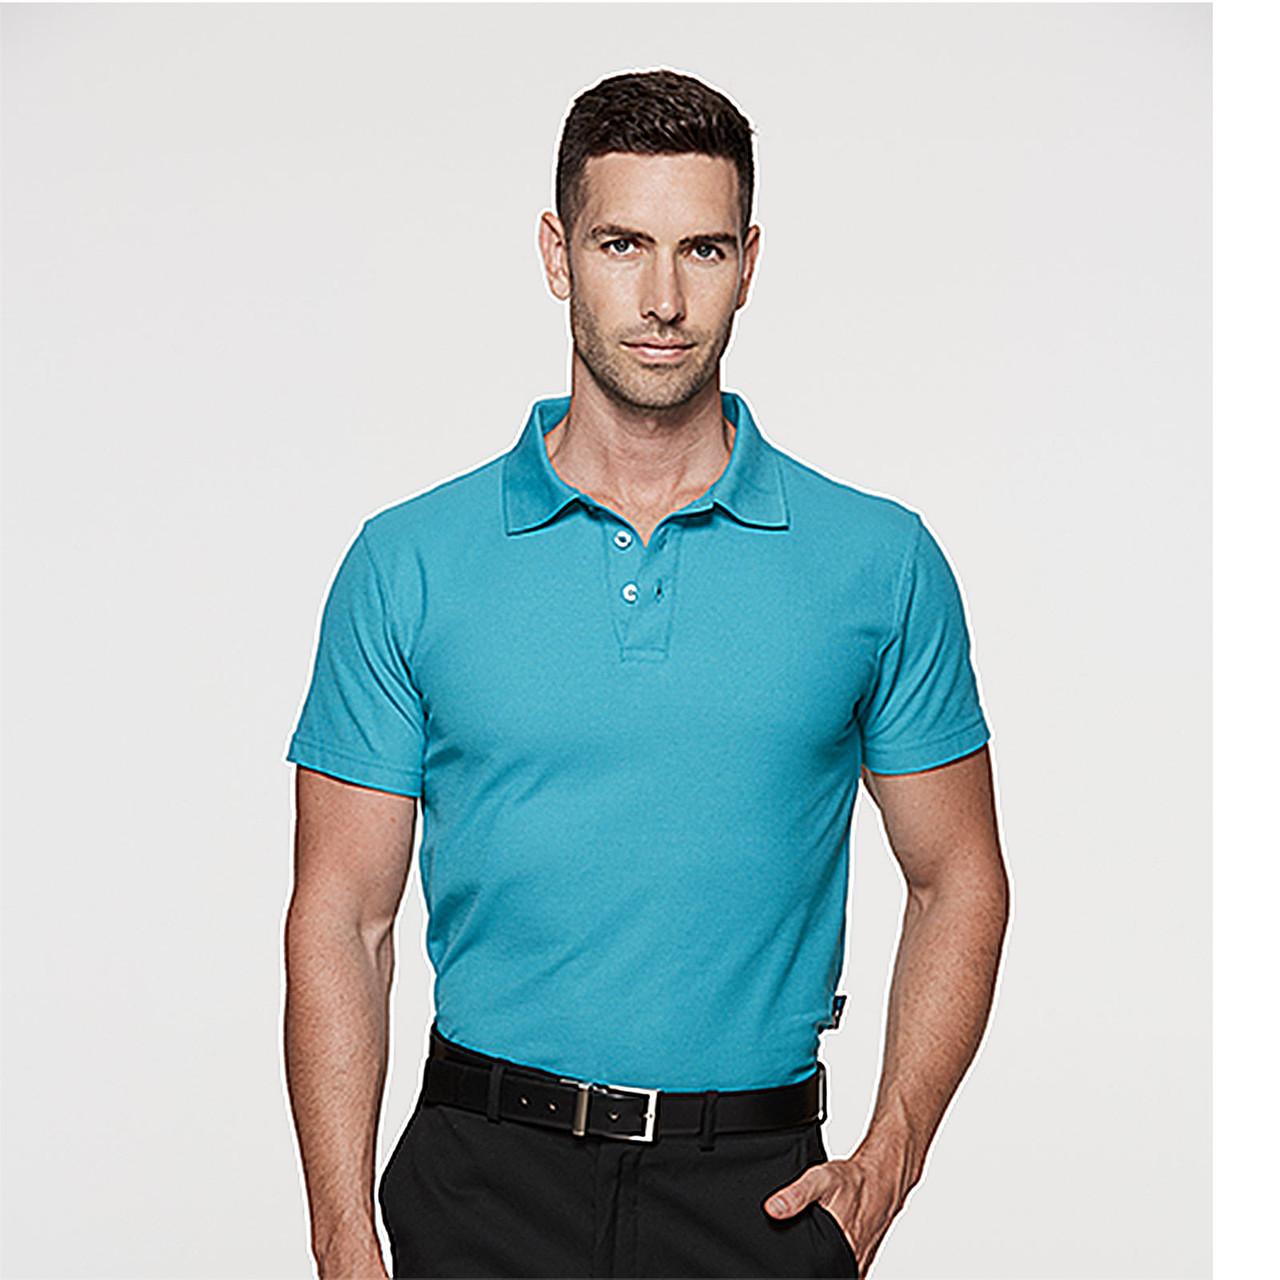 Click Workwear Polo Shirt Polycotton Unisex Work Wear Short Sleeve Plain Mens